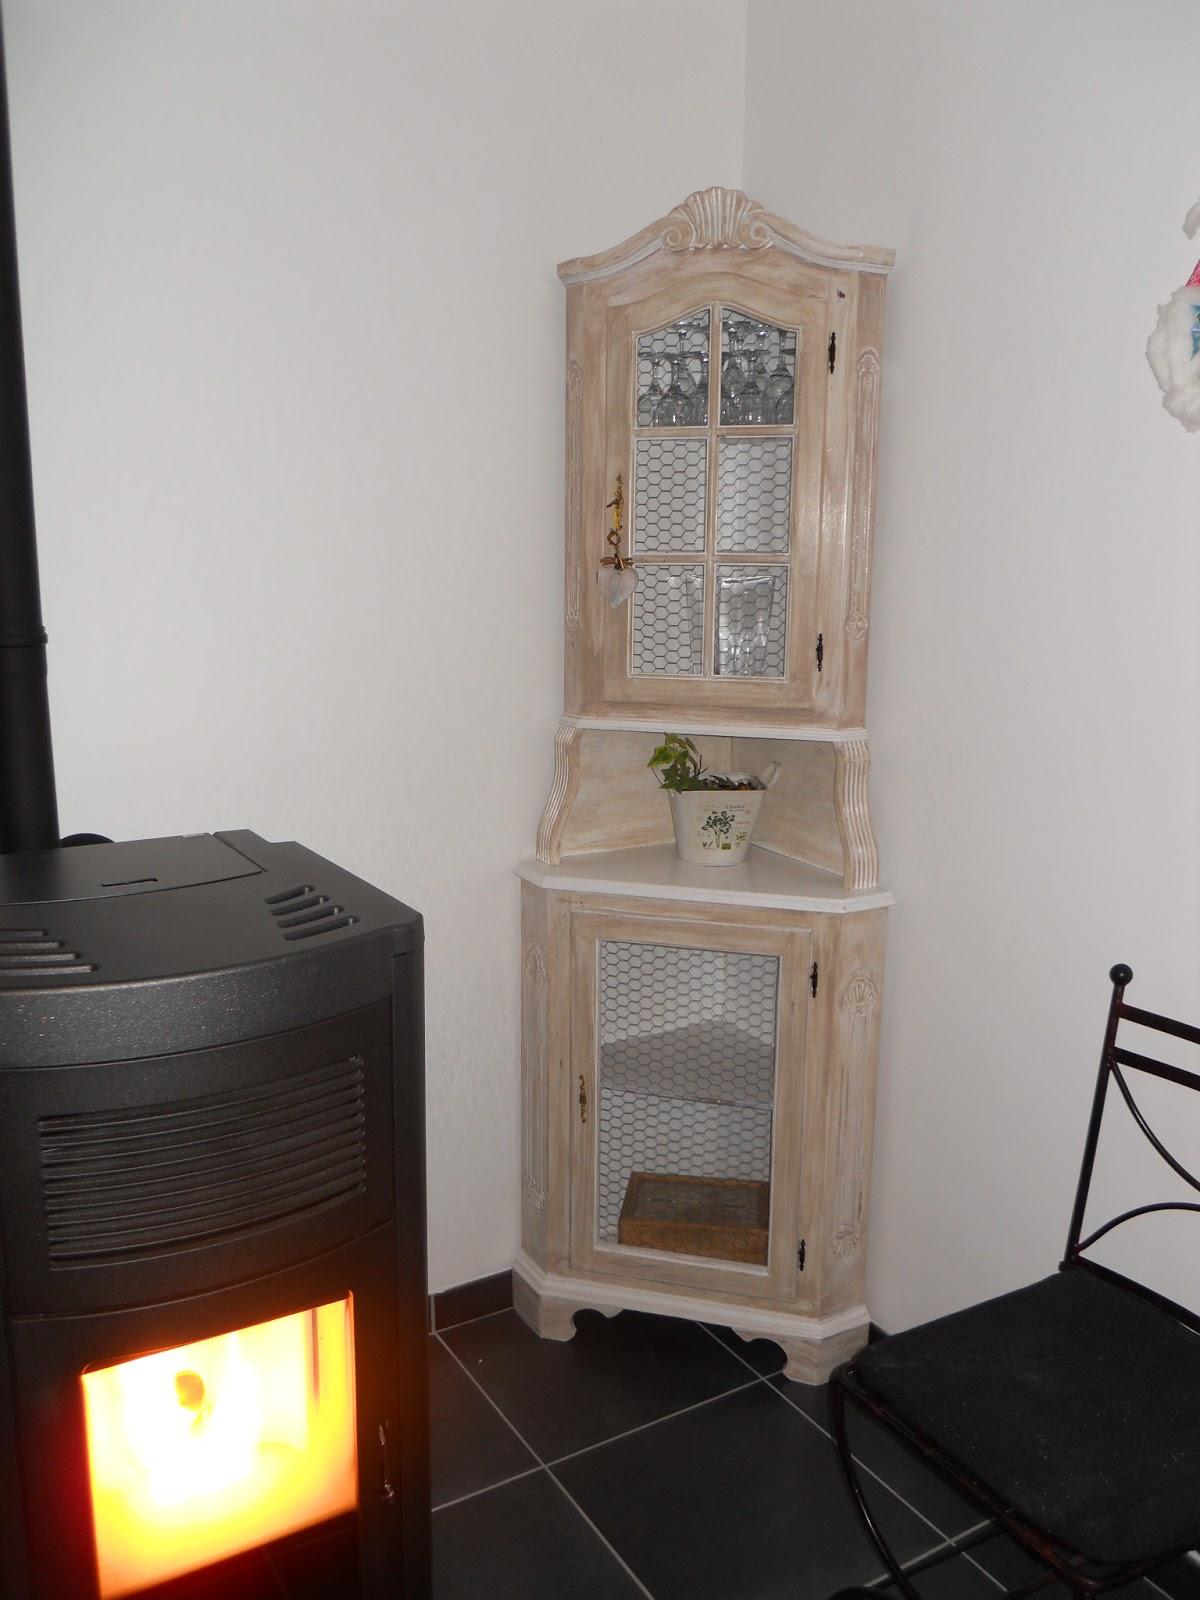 meubles d co meuble d 39 angle enti rement relook au style charme. Black Bedroom Furniture Sets. Home Design Ideas